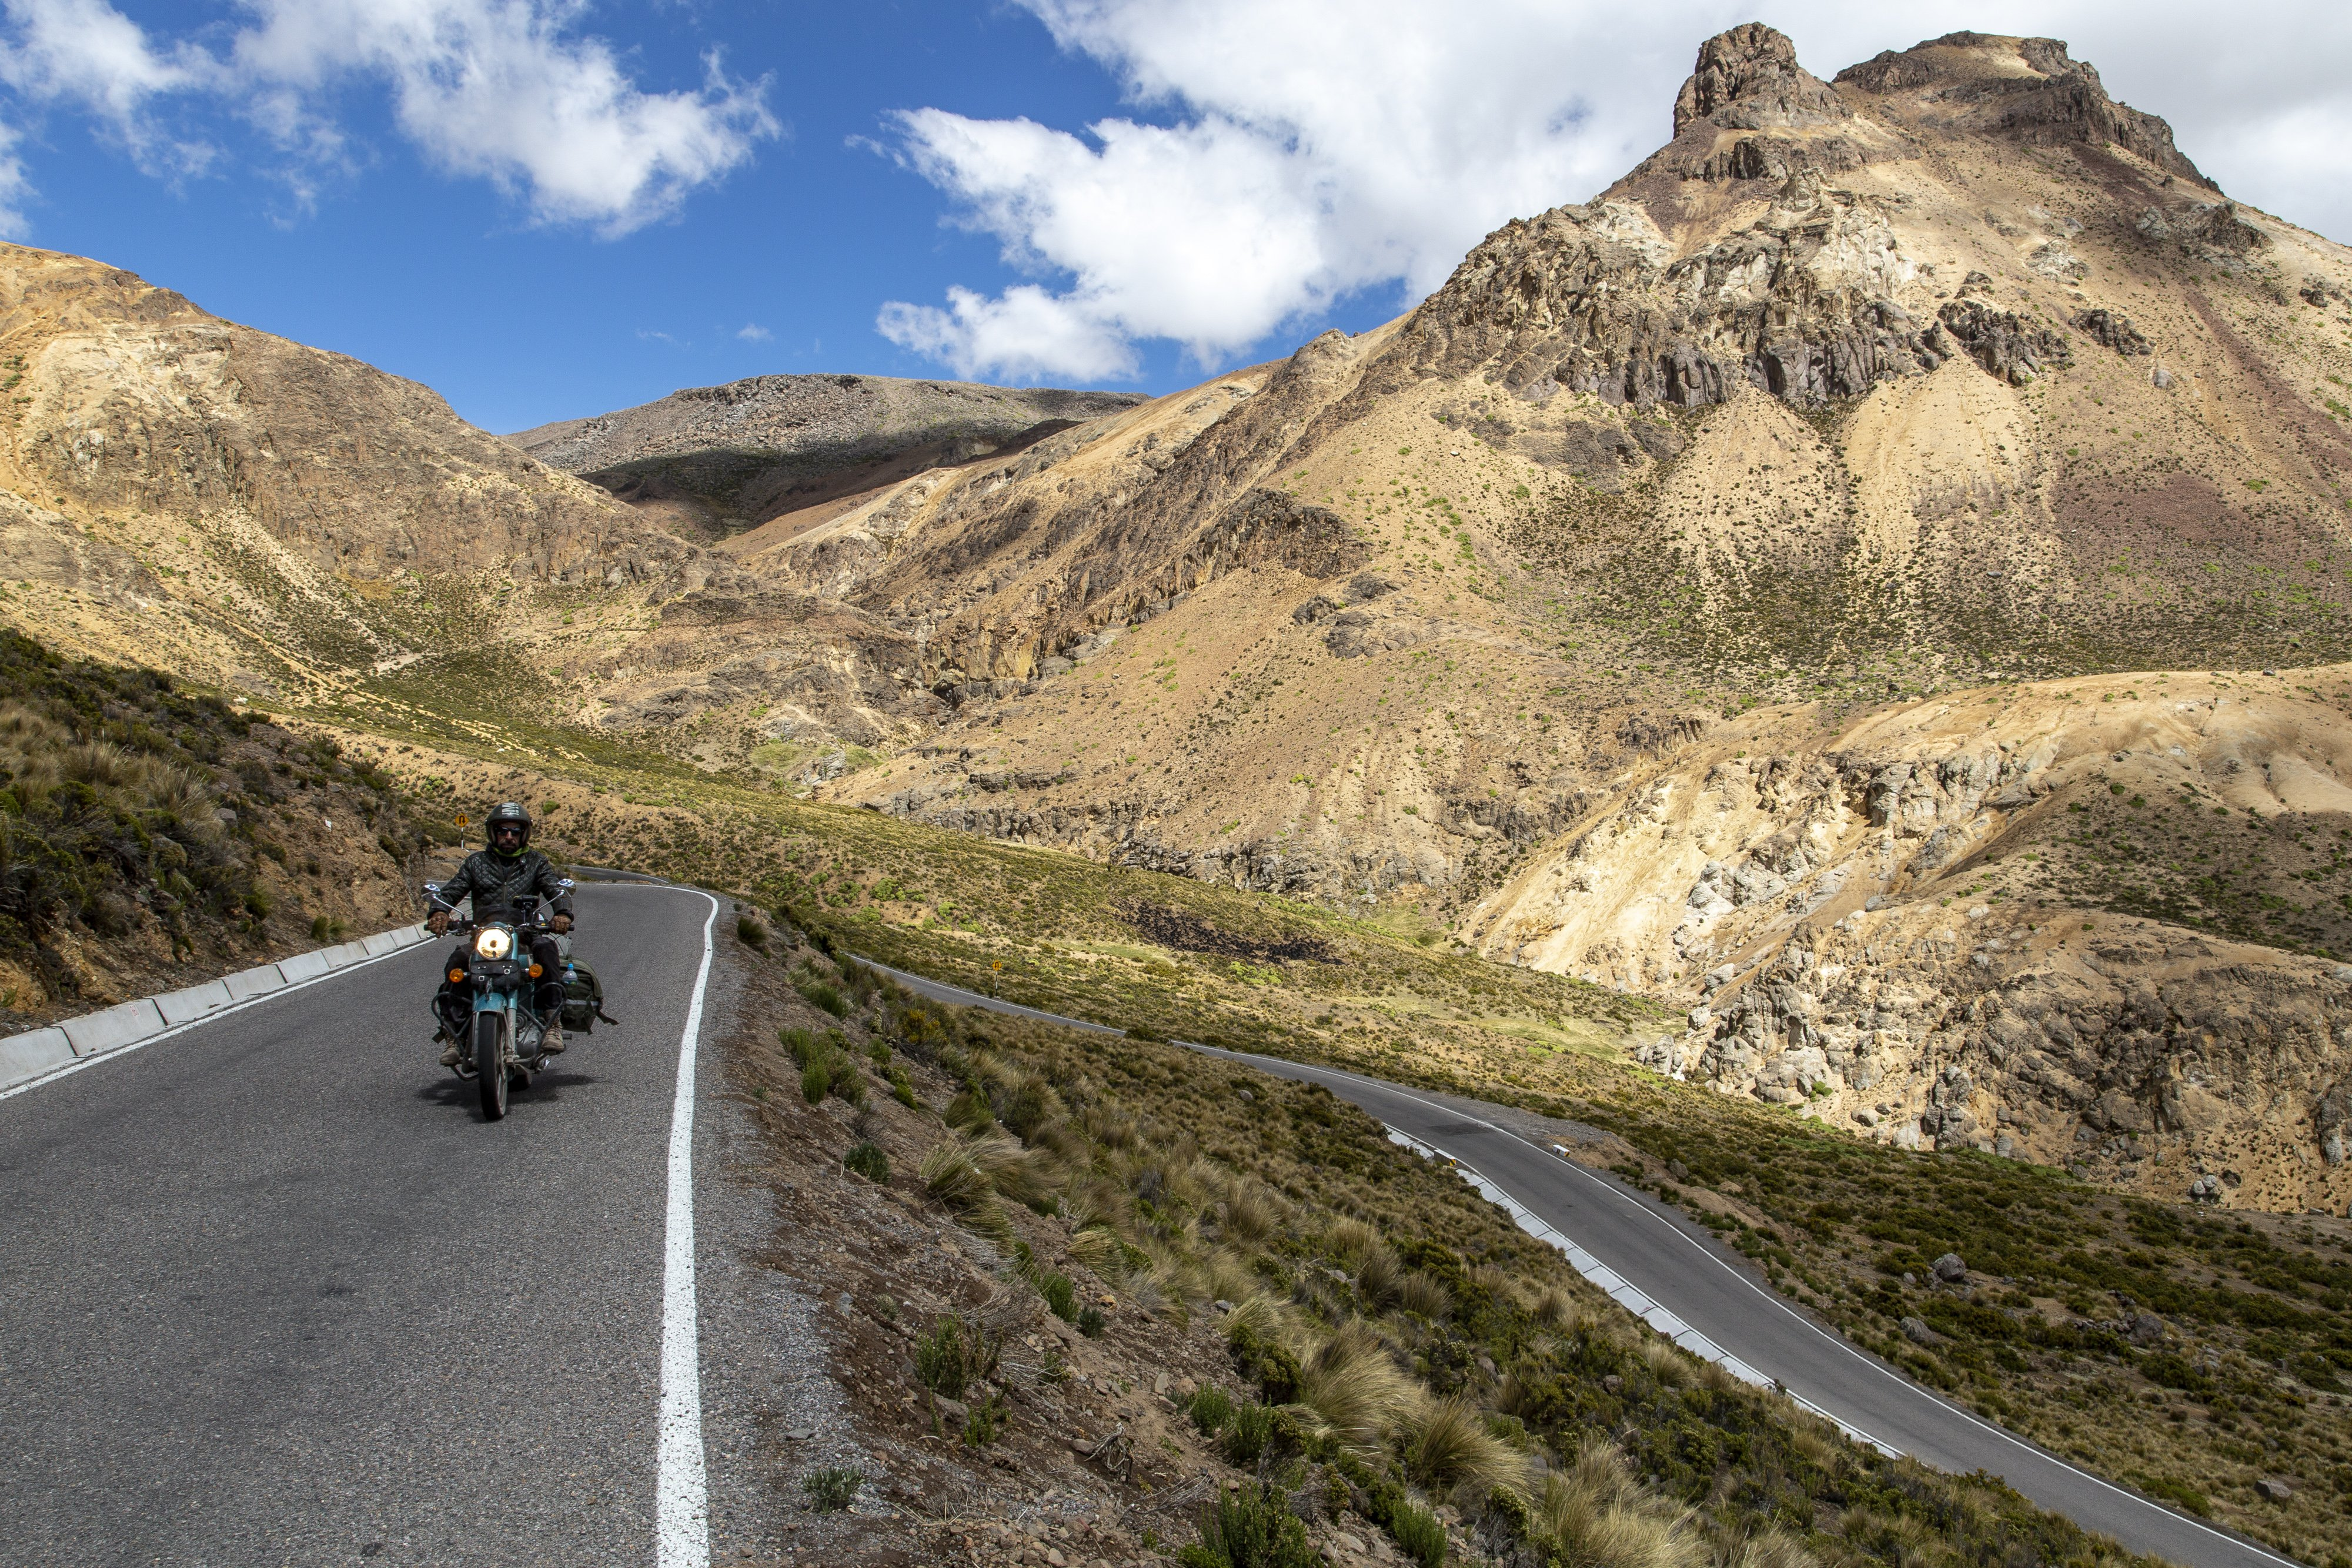 Motorcycle road trip Peru - Inca Treasures in the High Andes